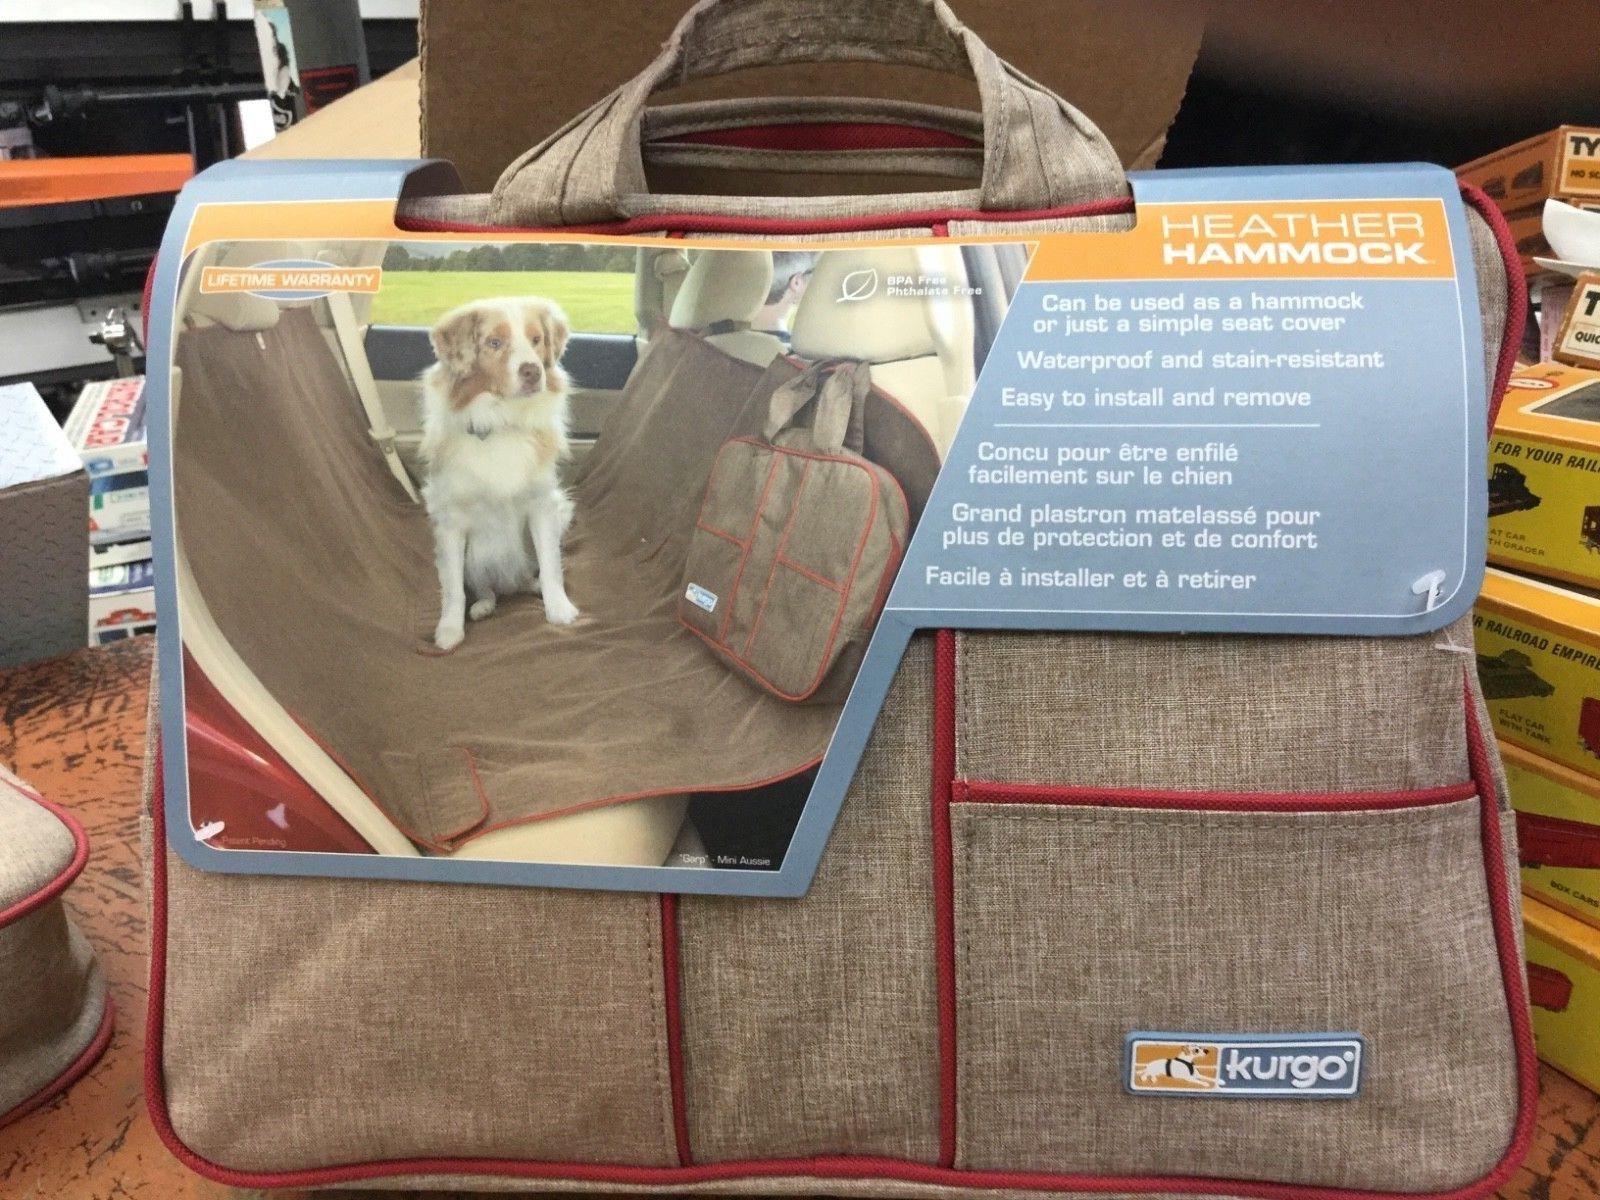 New kurgo heather hammock u seat cover for pets beigered car